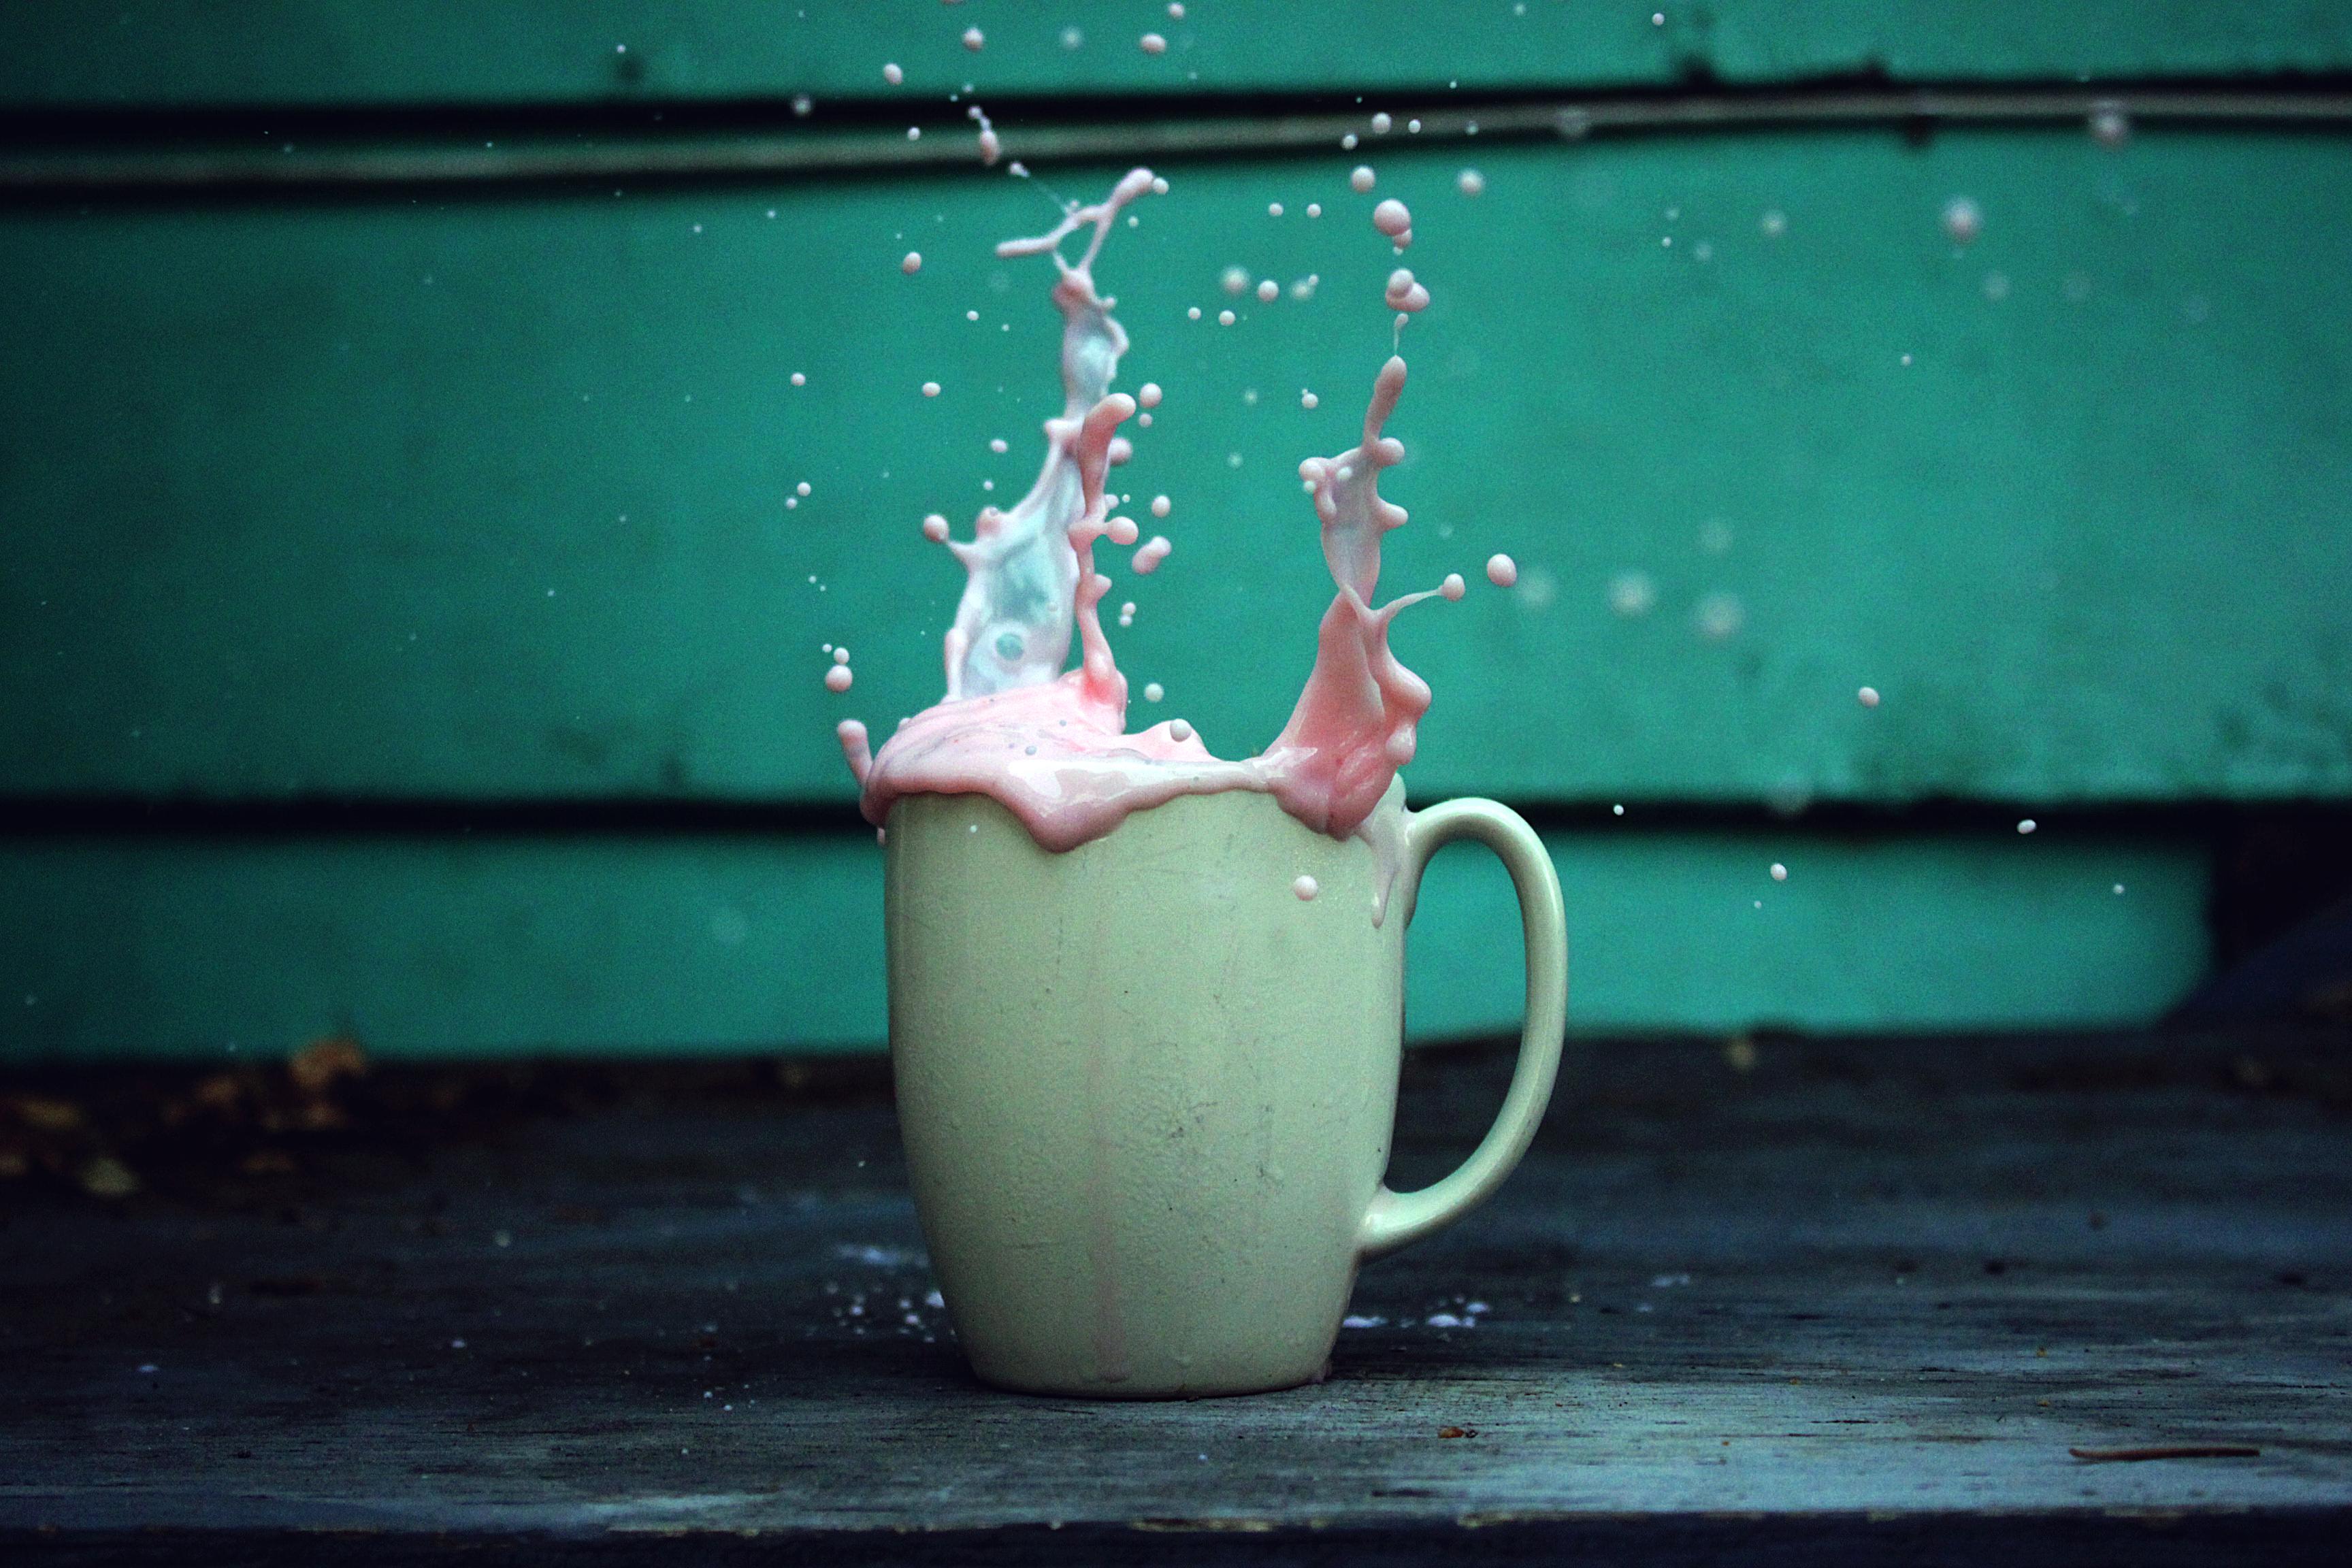 красивые картинки брызги кофе предстоят